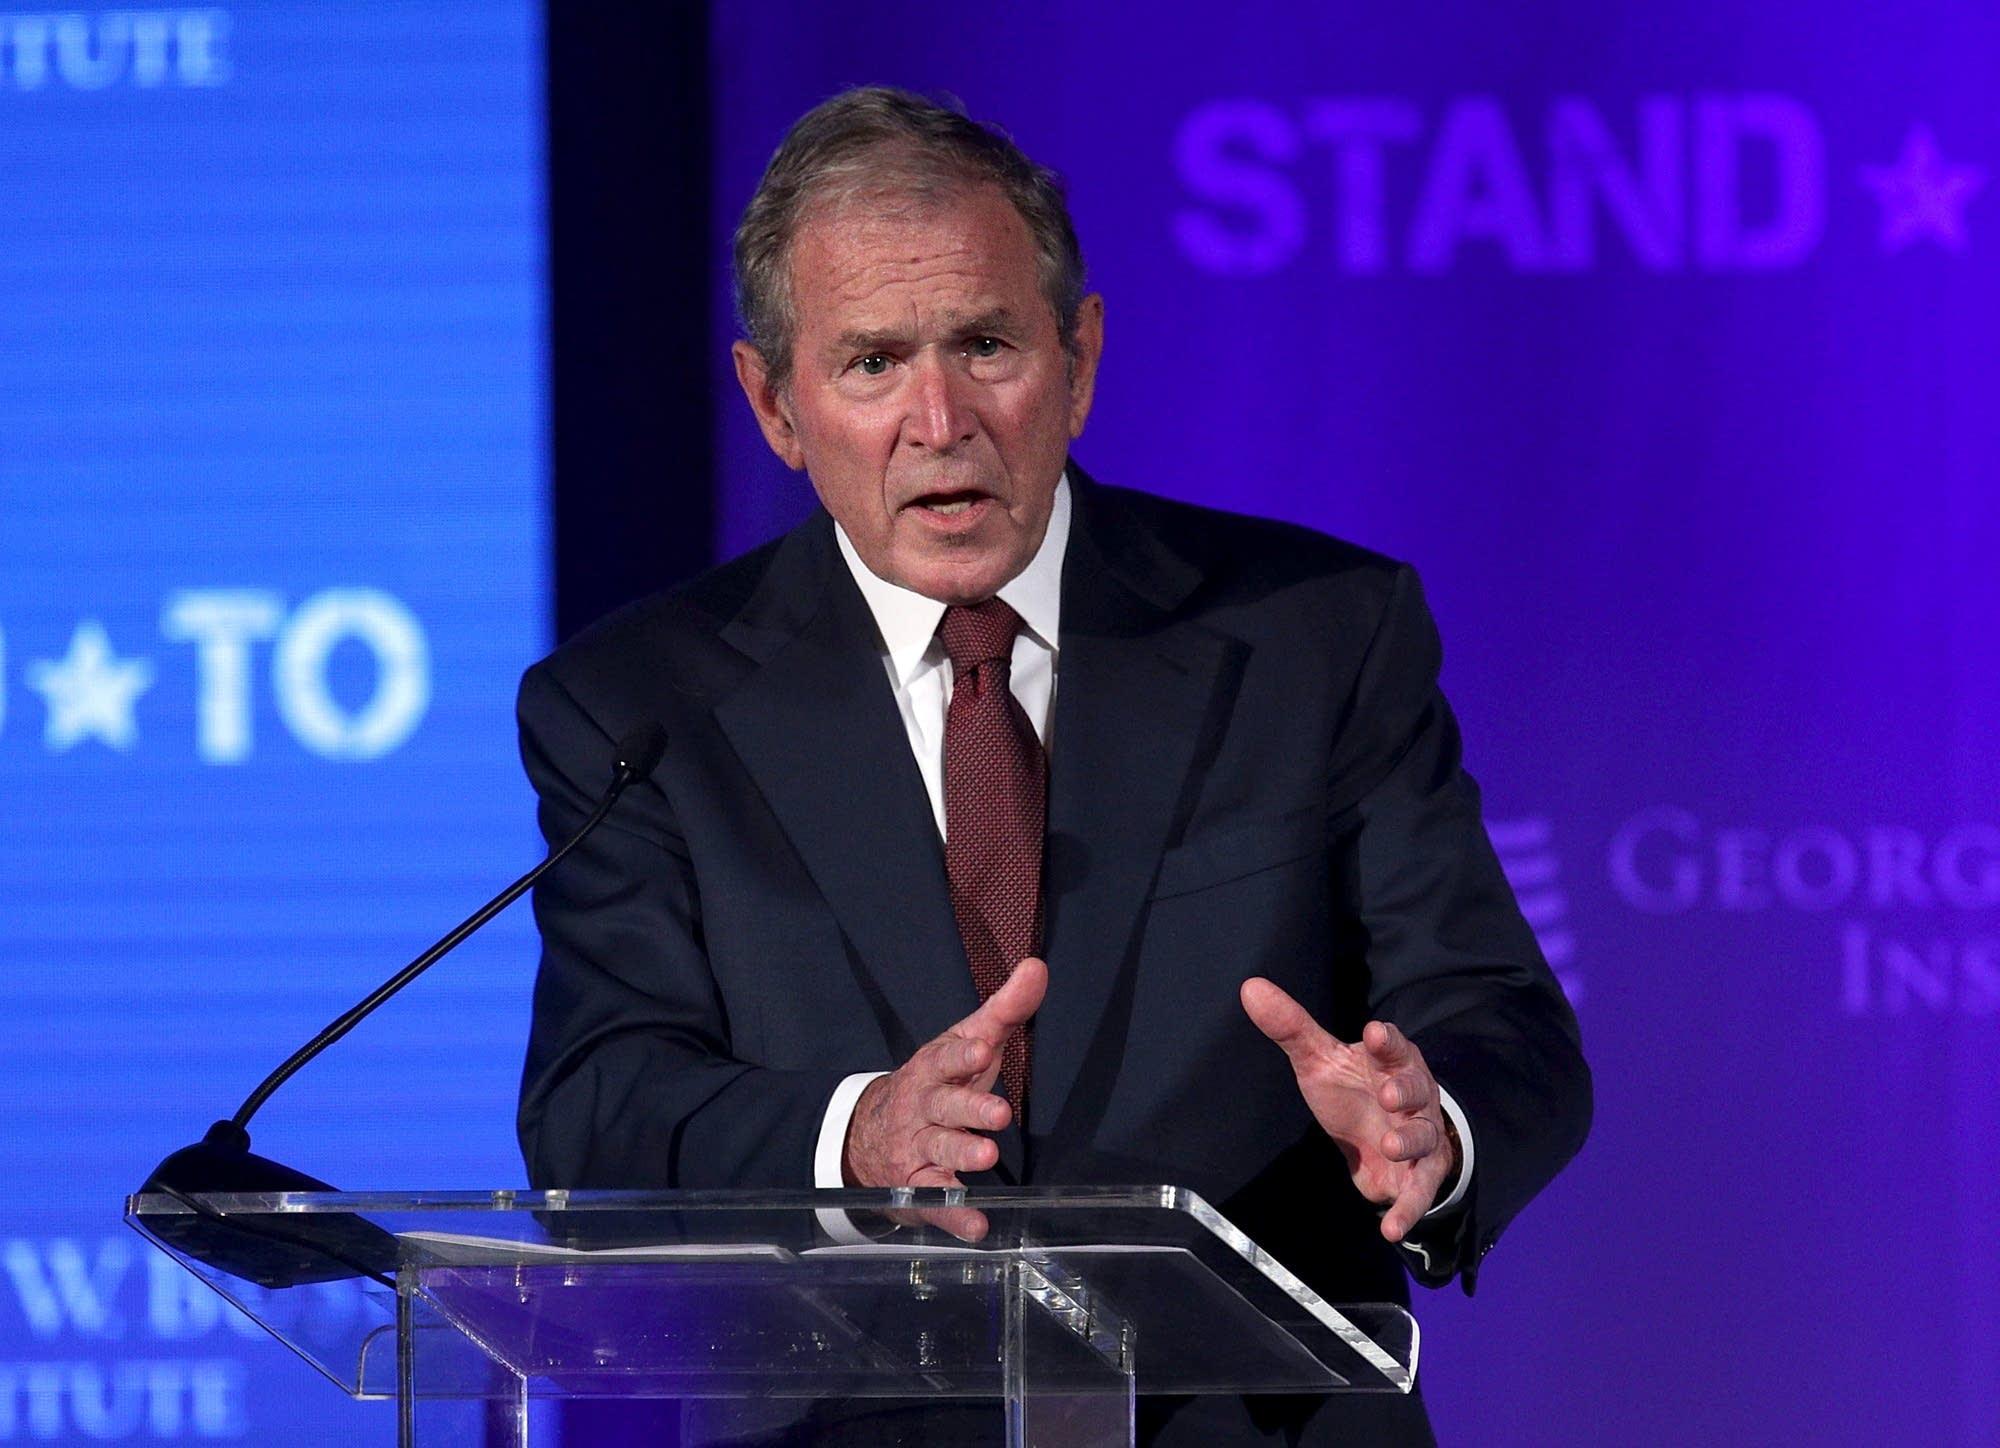 Former U.S. President George W. Bush speaks during a conference.